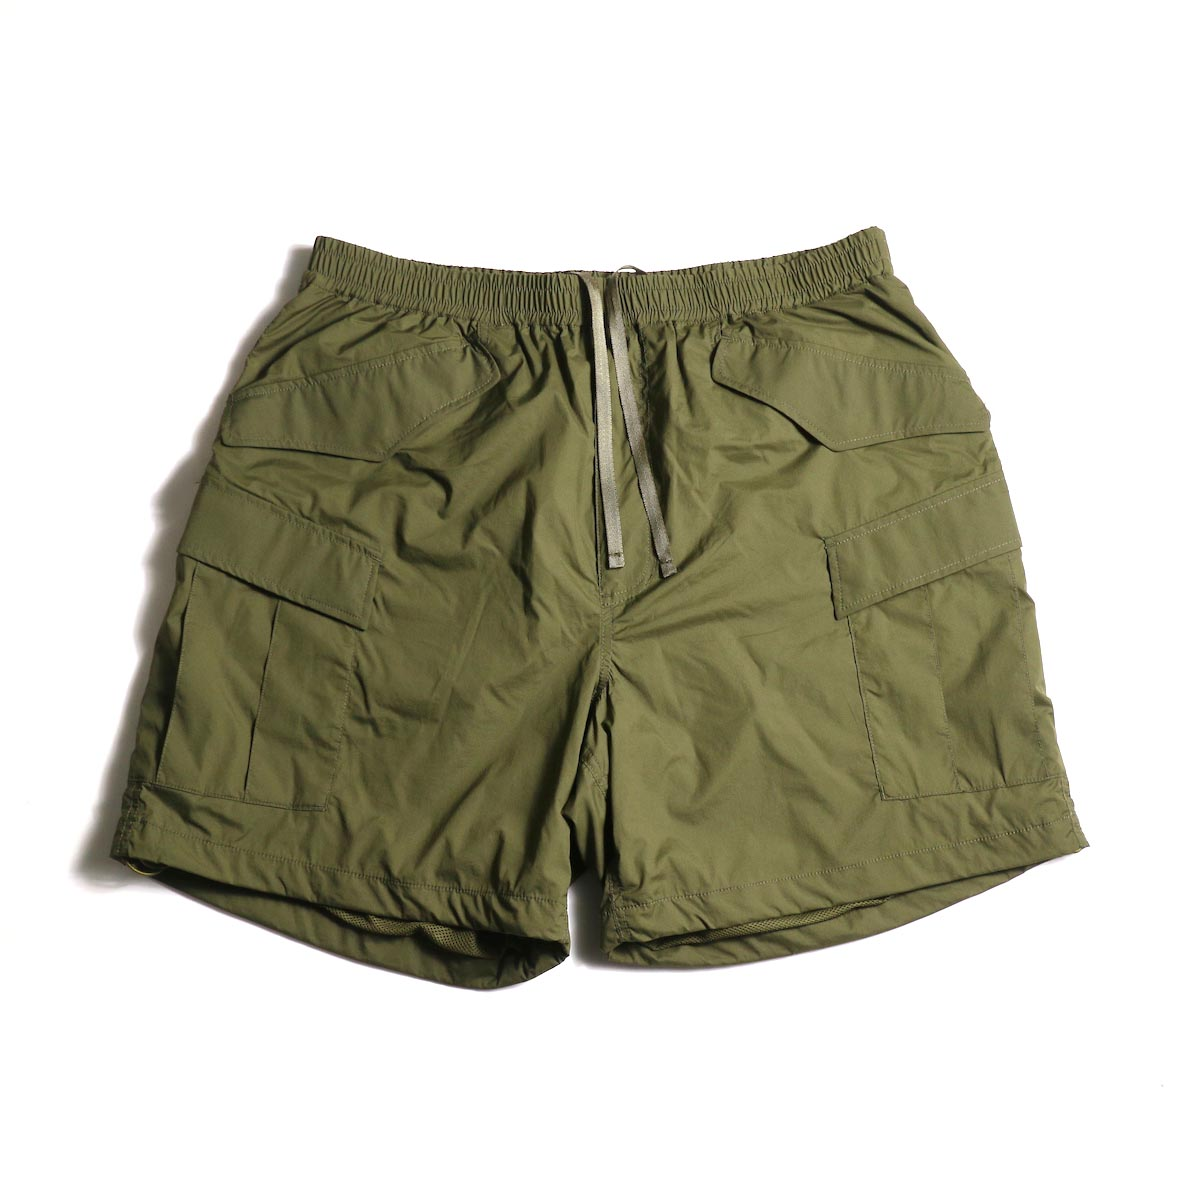 DAIWA PIER39 / Micro Rip-Stop Easy 6P Shorts (Dark Olive)